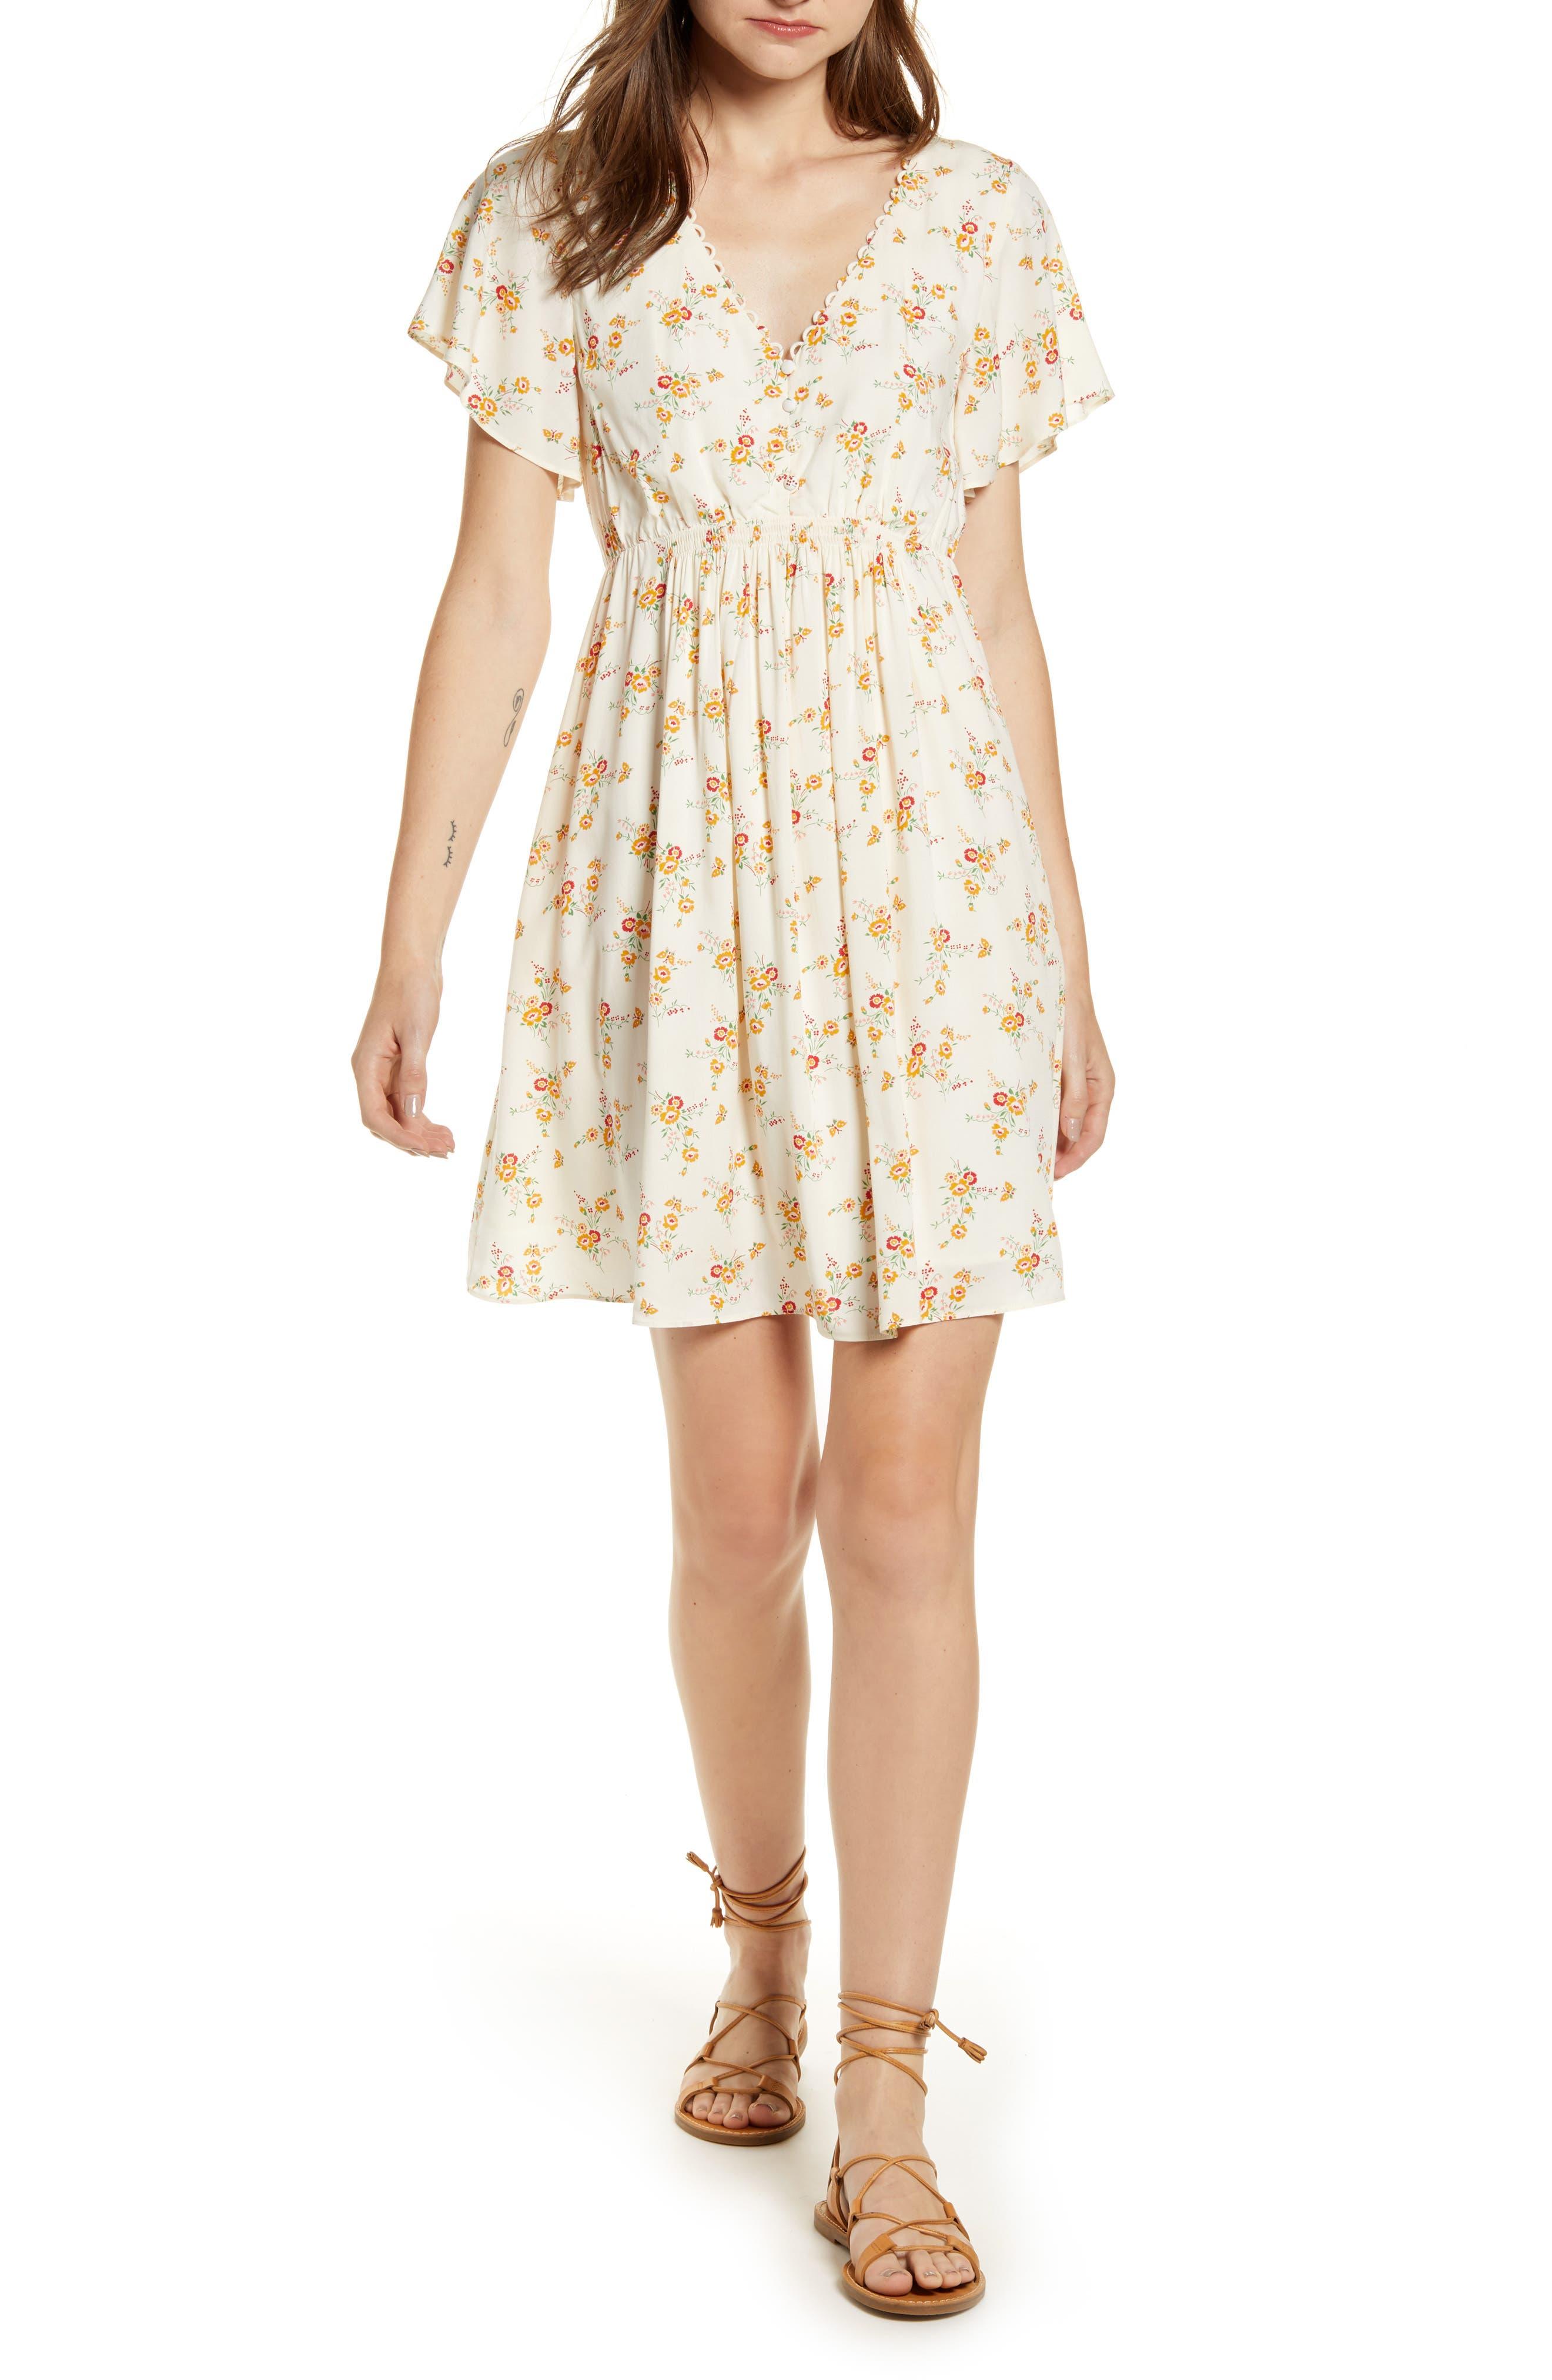 Madewell Floral Loop Trim Minidress, Ivory